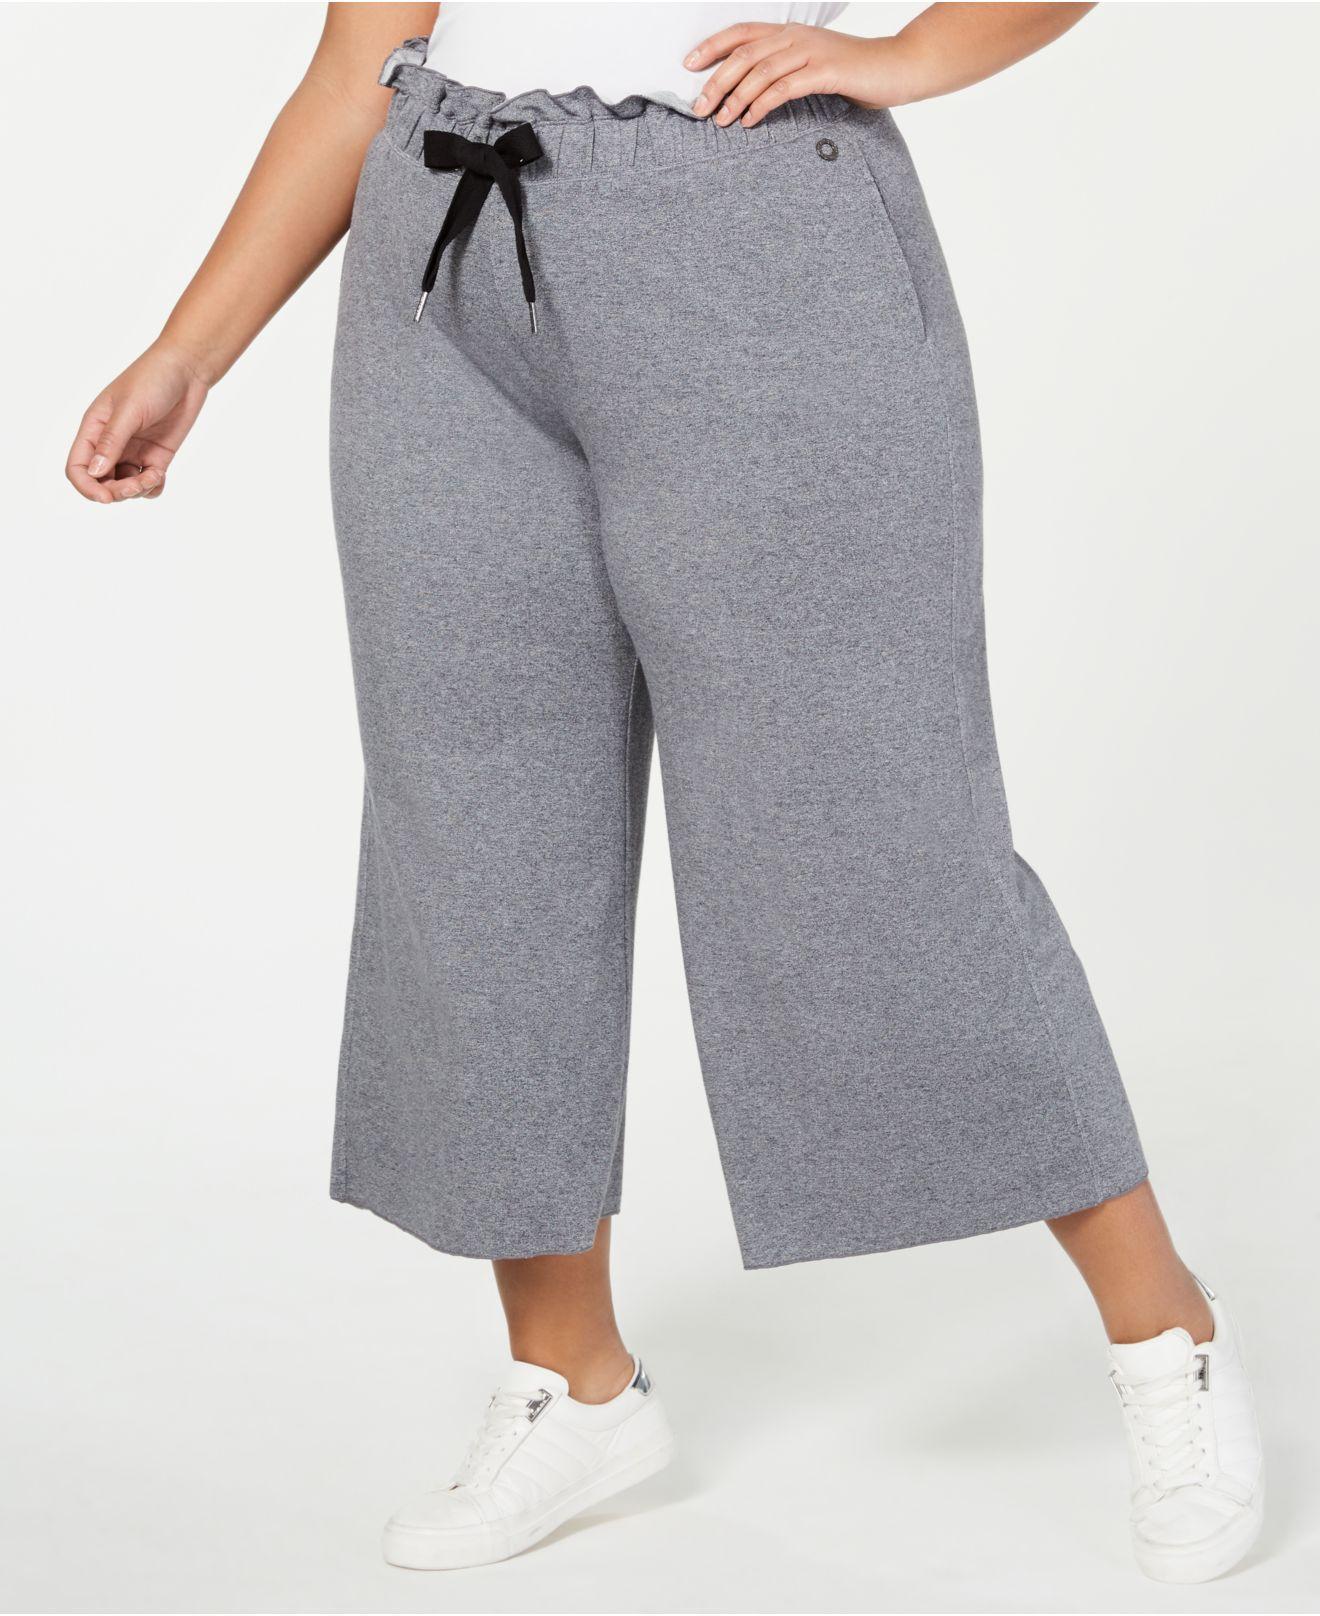 ab8c5e675d5 Calvin Klein. Women s Gray Performance Plus Size High-waist Cropped Pants